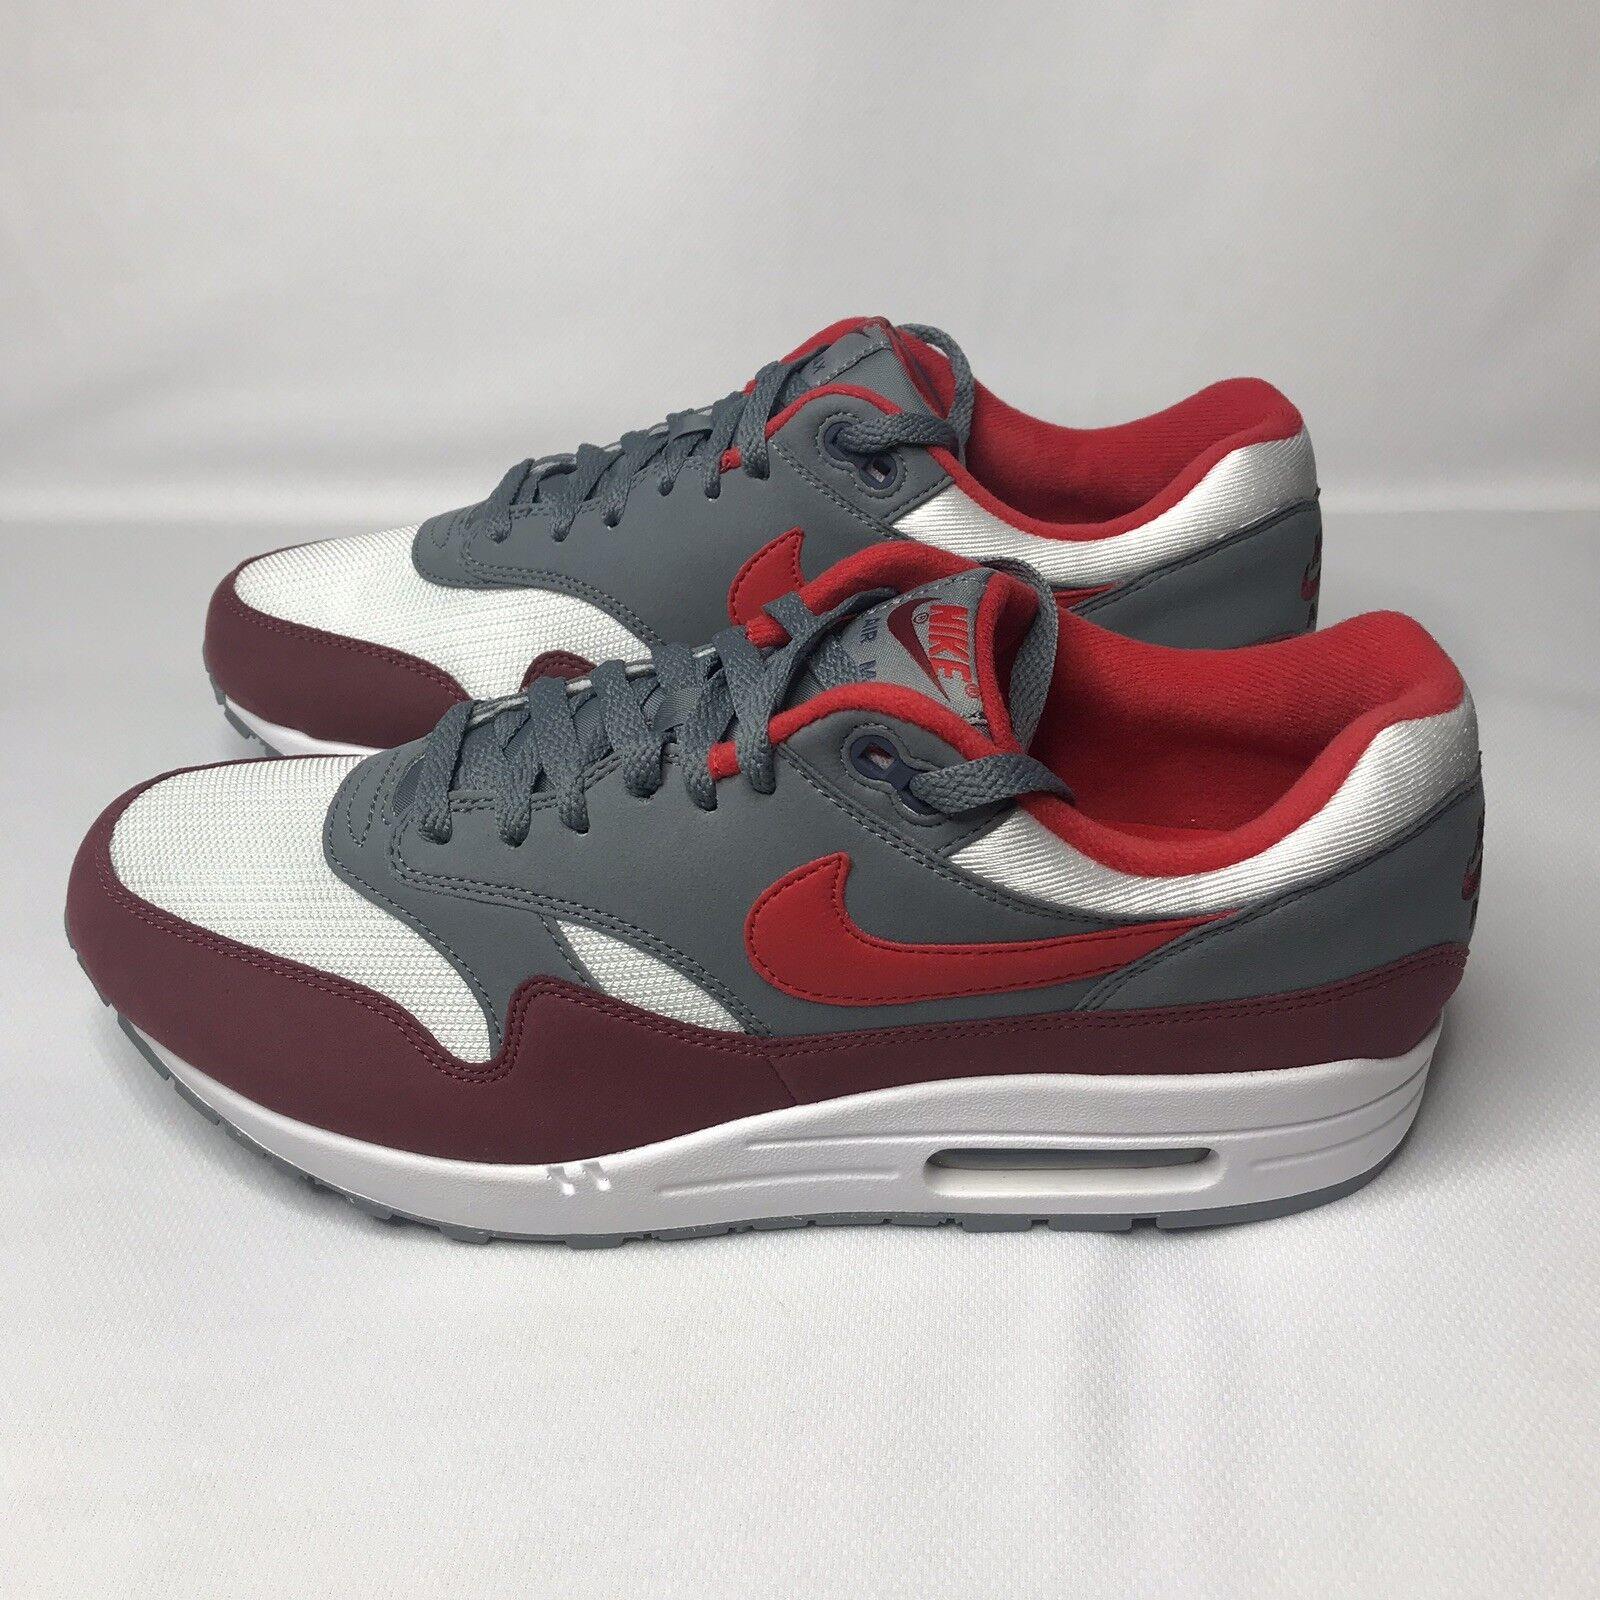 Nike Air Max 1 White University Red Cool Grey shoes Men's Sz 8 AH8145 100